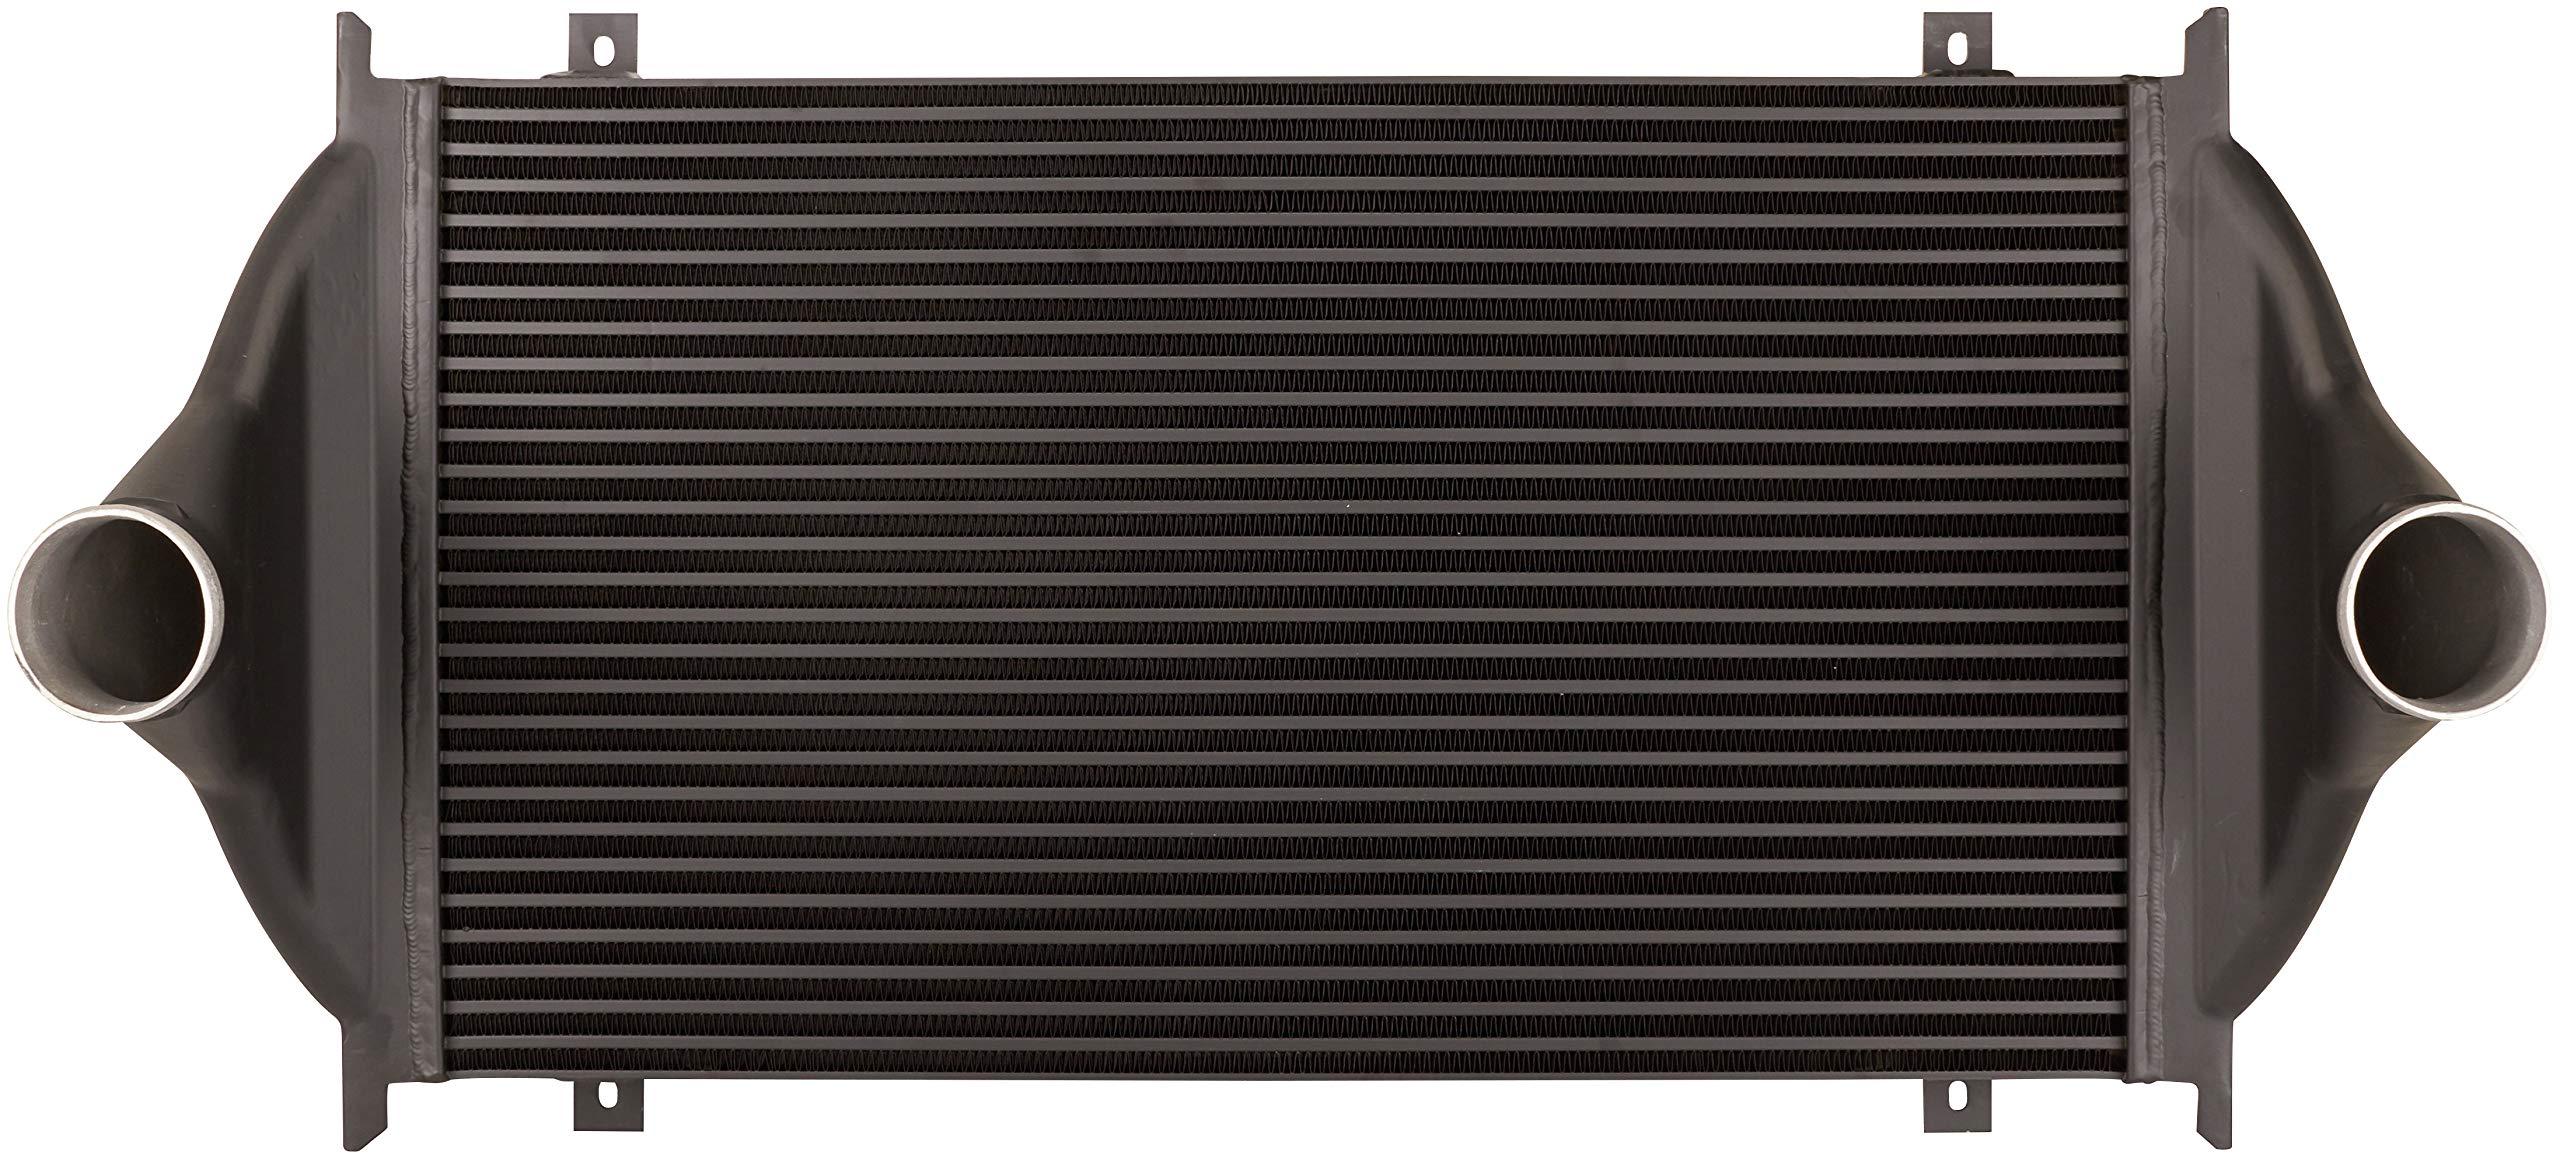 Spectra Premium 4401-1701 Turbocharger Intercooler